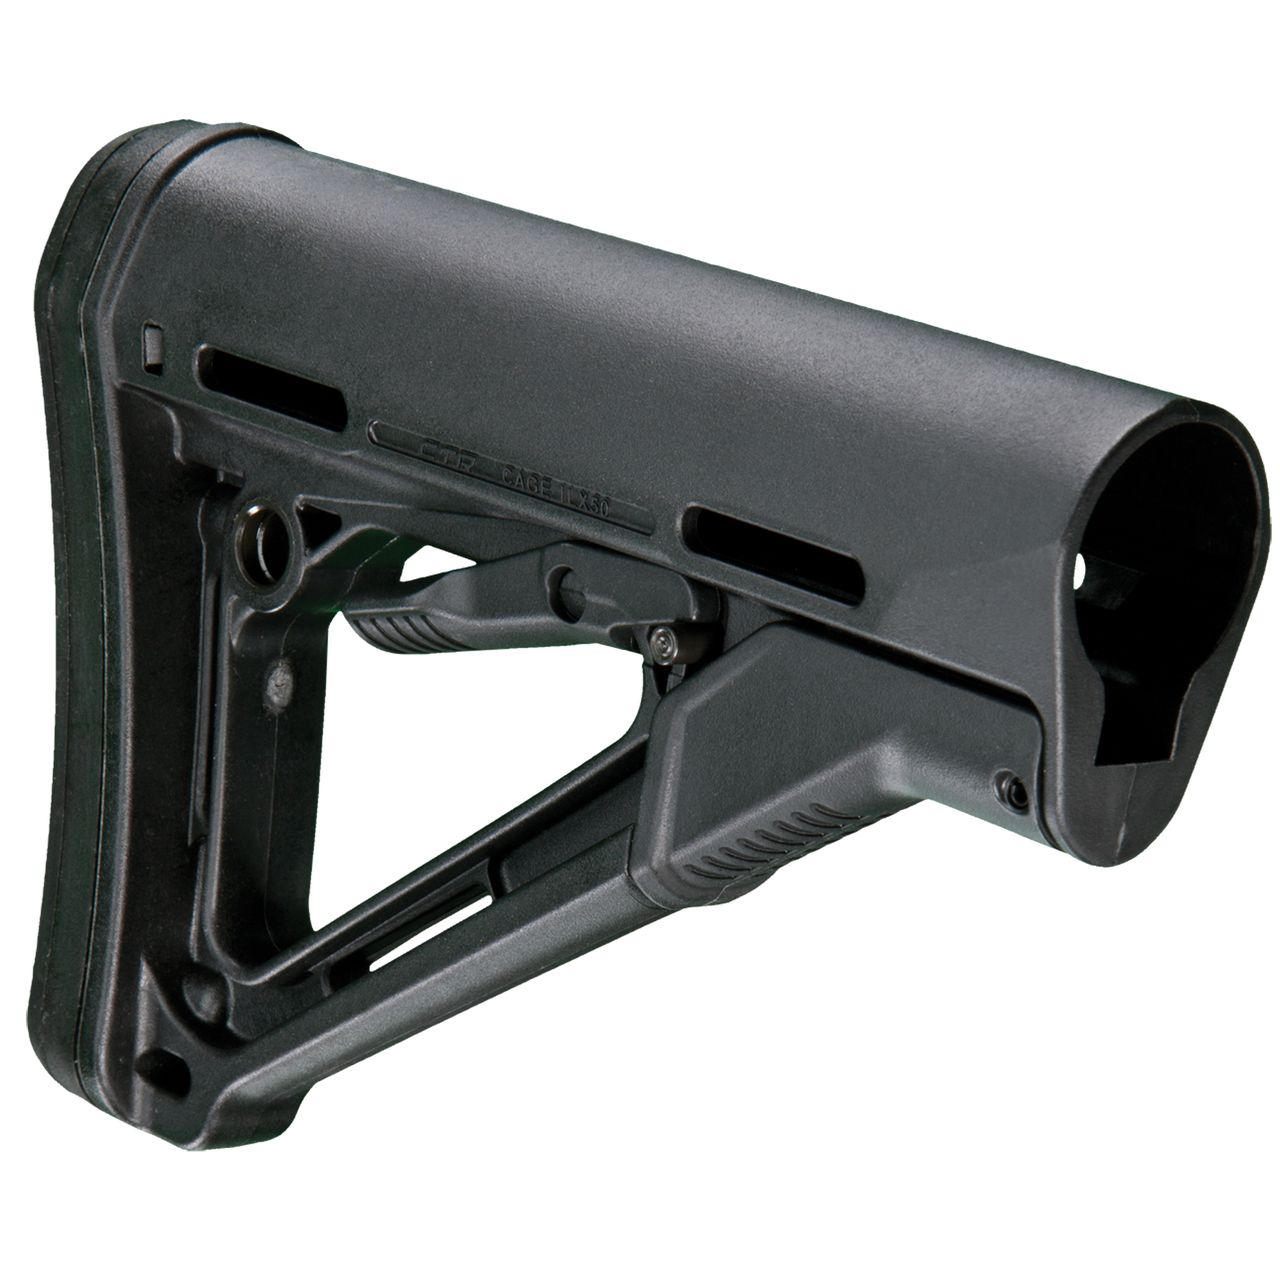 Magpul CTR Carbine Stock Mil-Spec Black